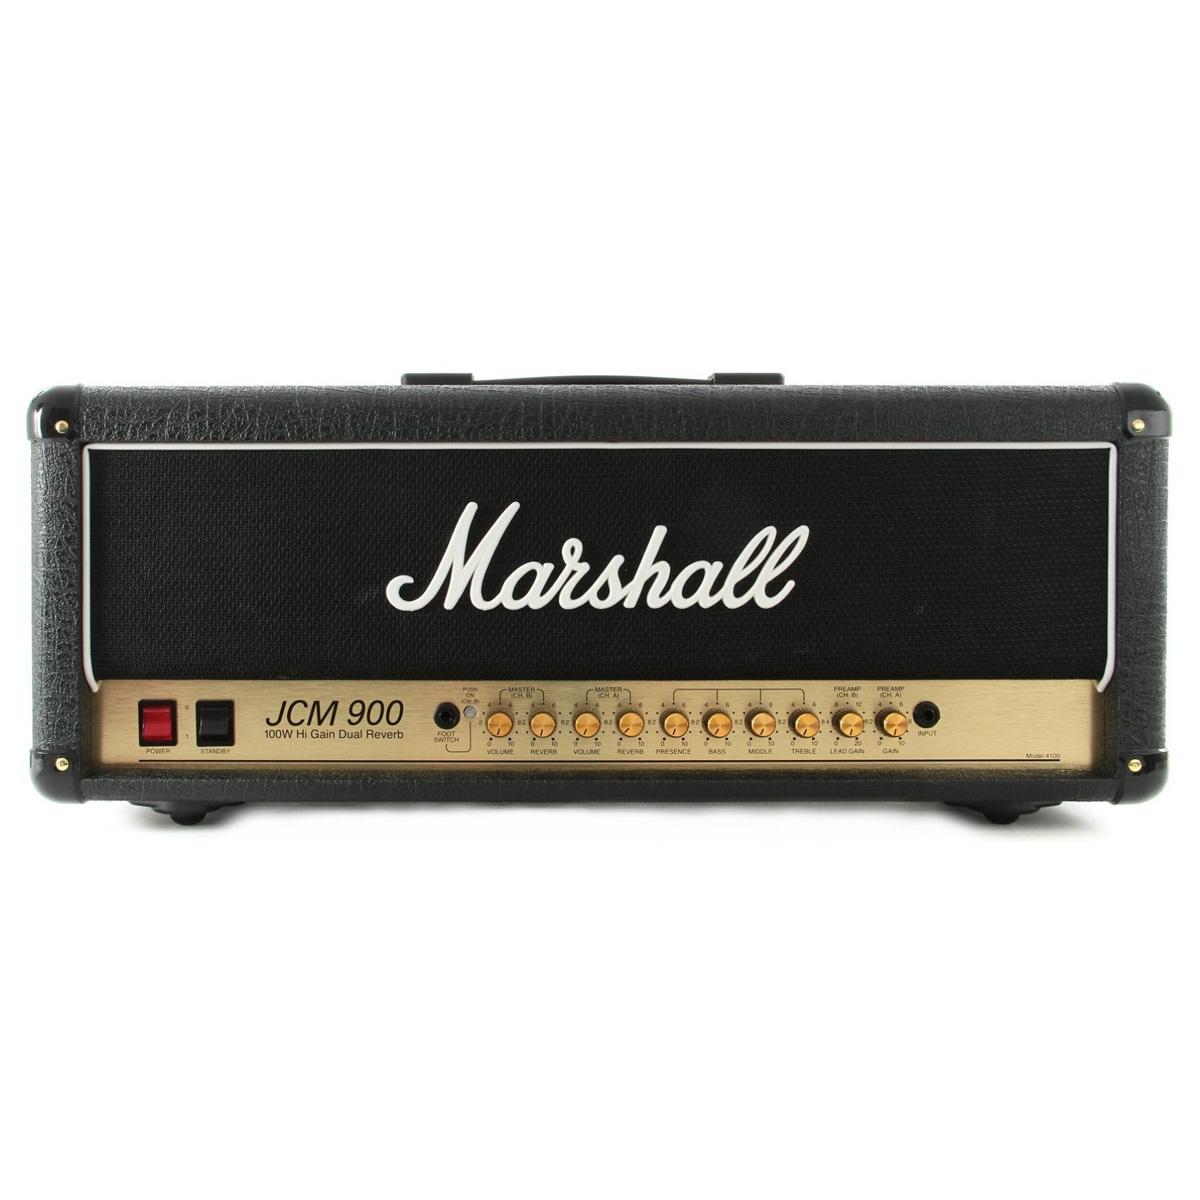 Marshall-4100-JCM900-100W-Dual-Reverb-Cabezal-front